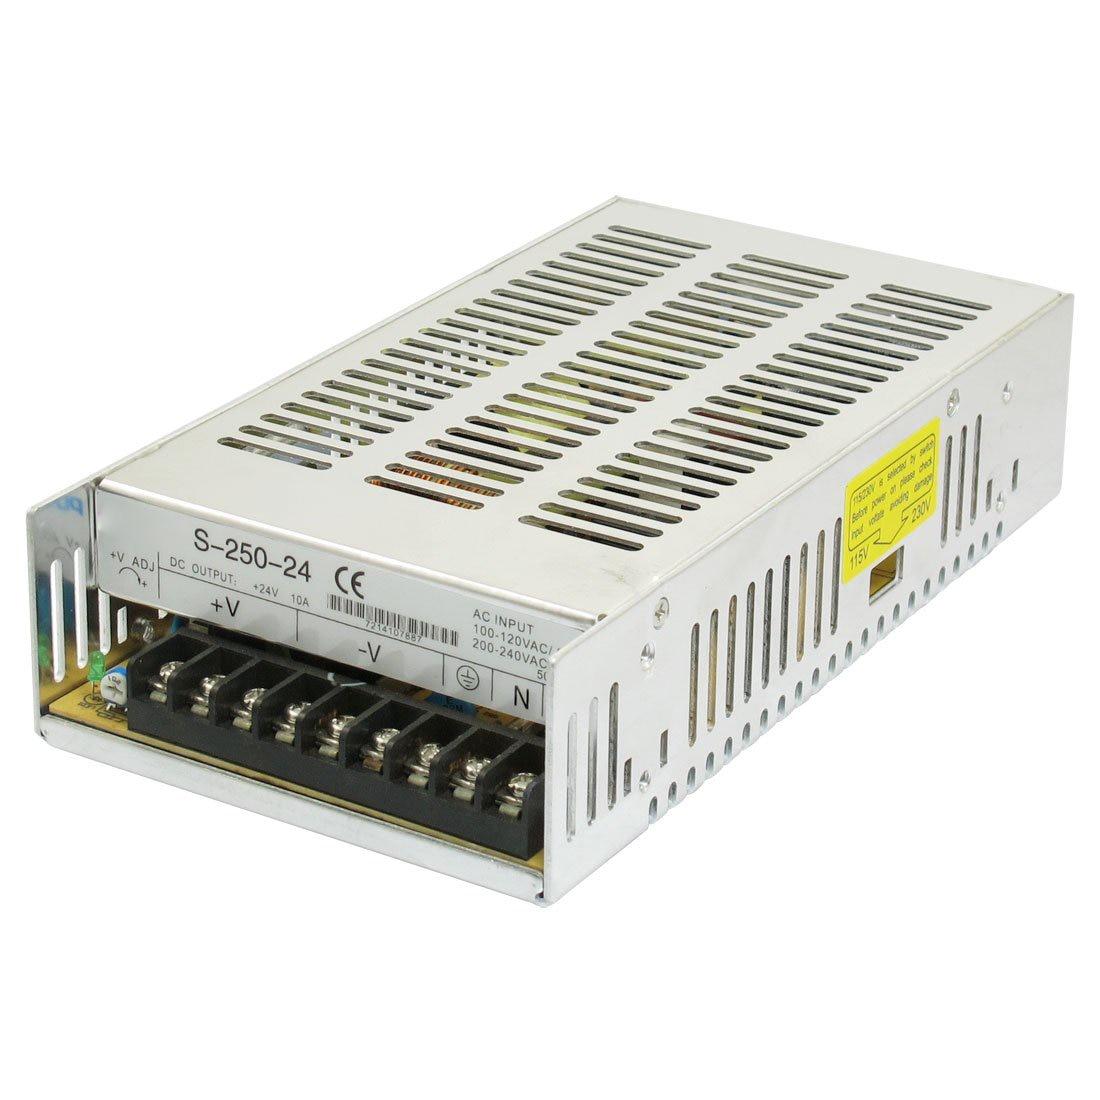 Fuente de alimentación conmutada de tres salidas, 24V CC, 10A, 250W para luz LED